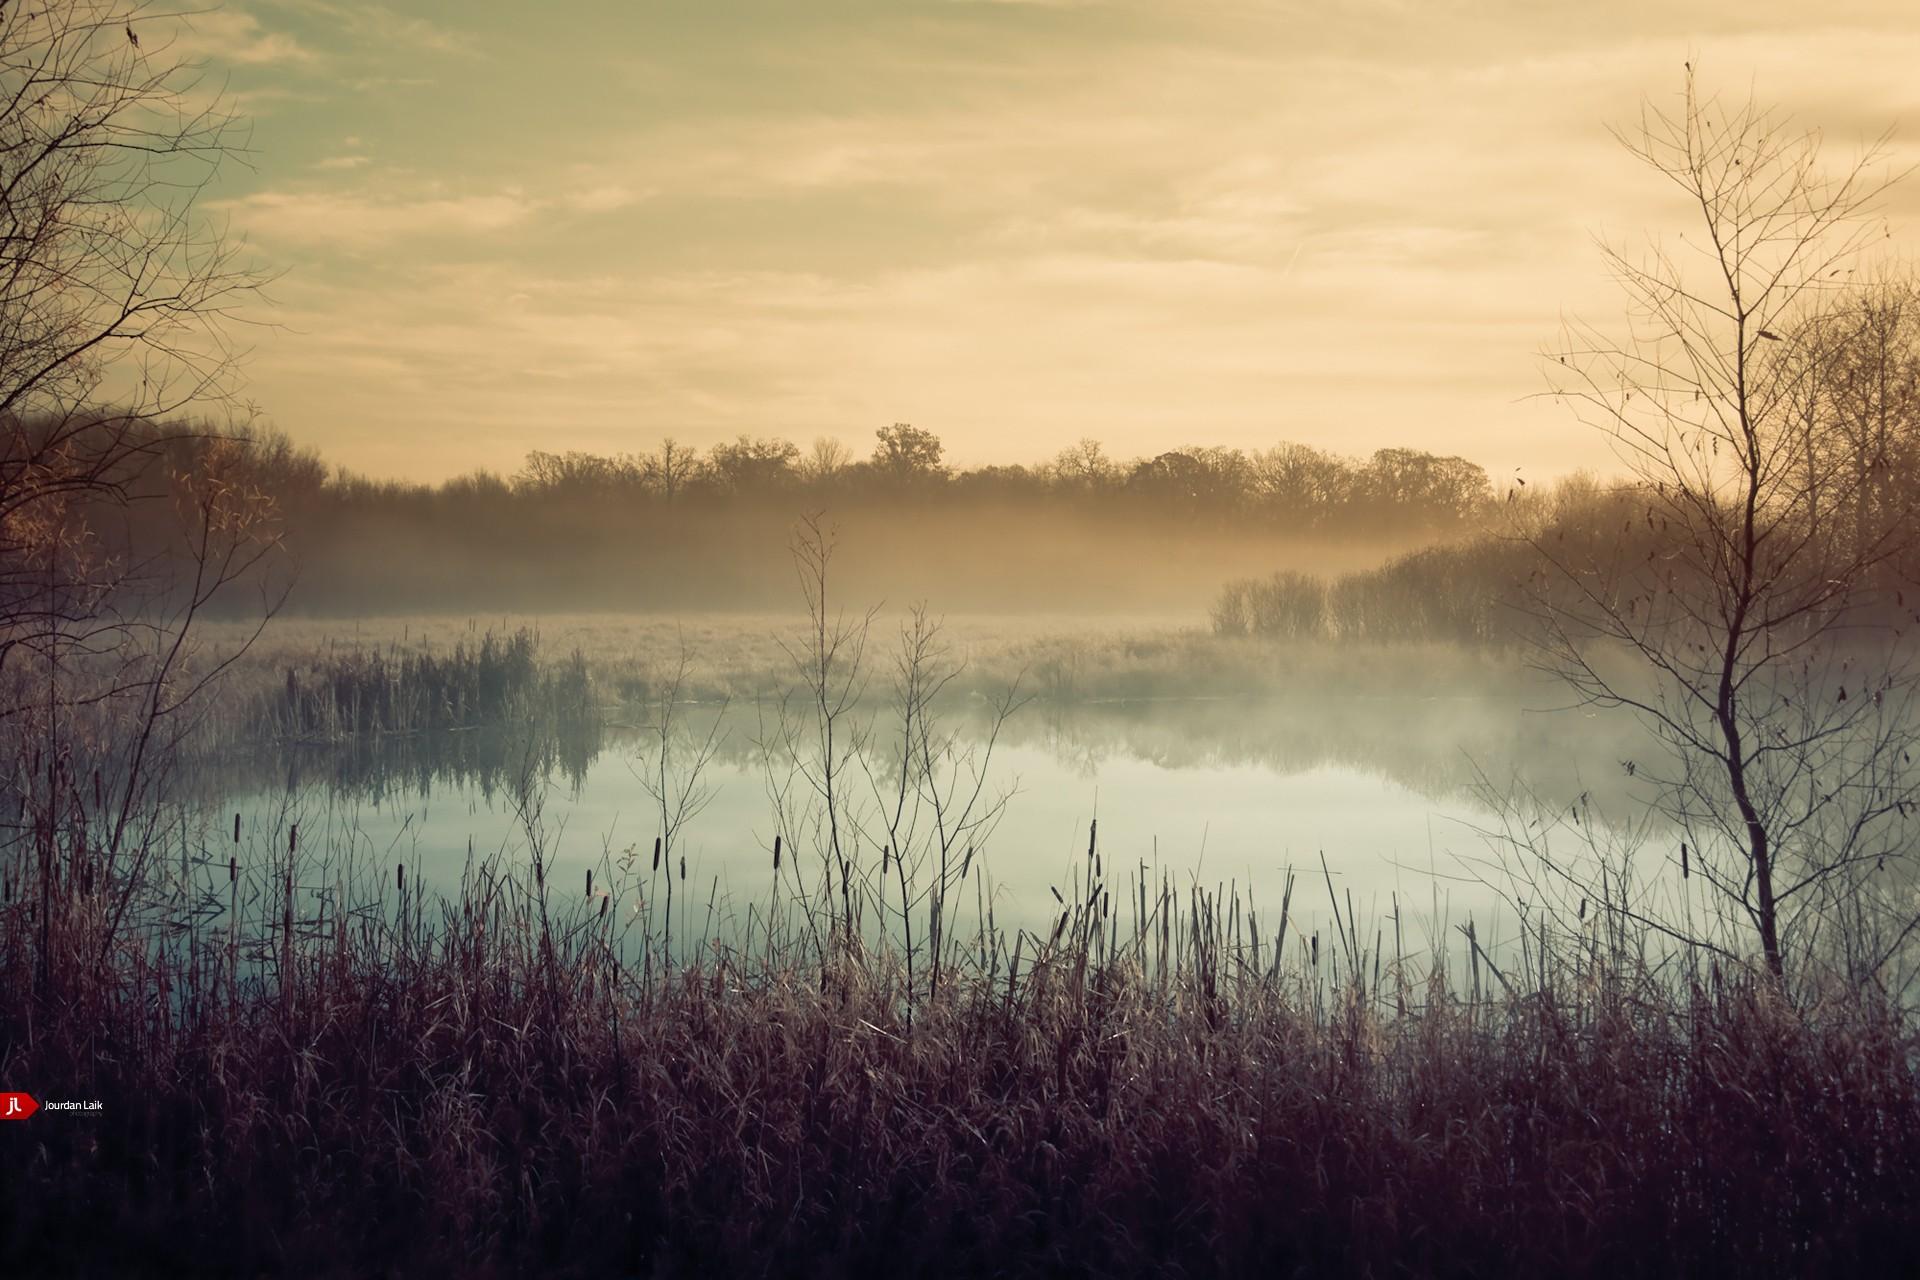 озеро туман обои на рабочий стол № 381760 без смс